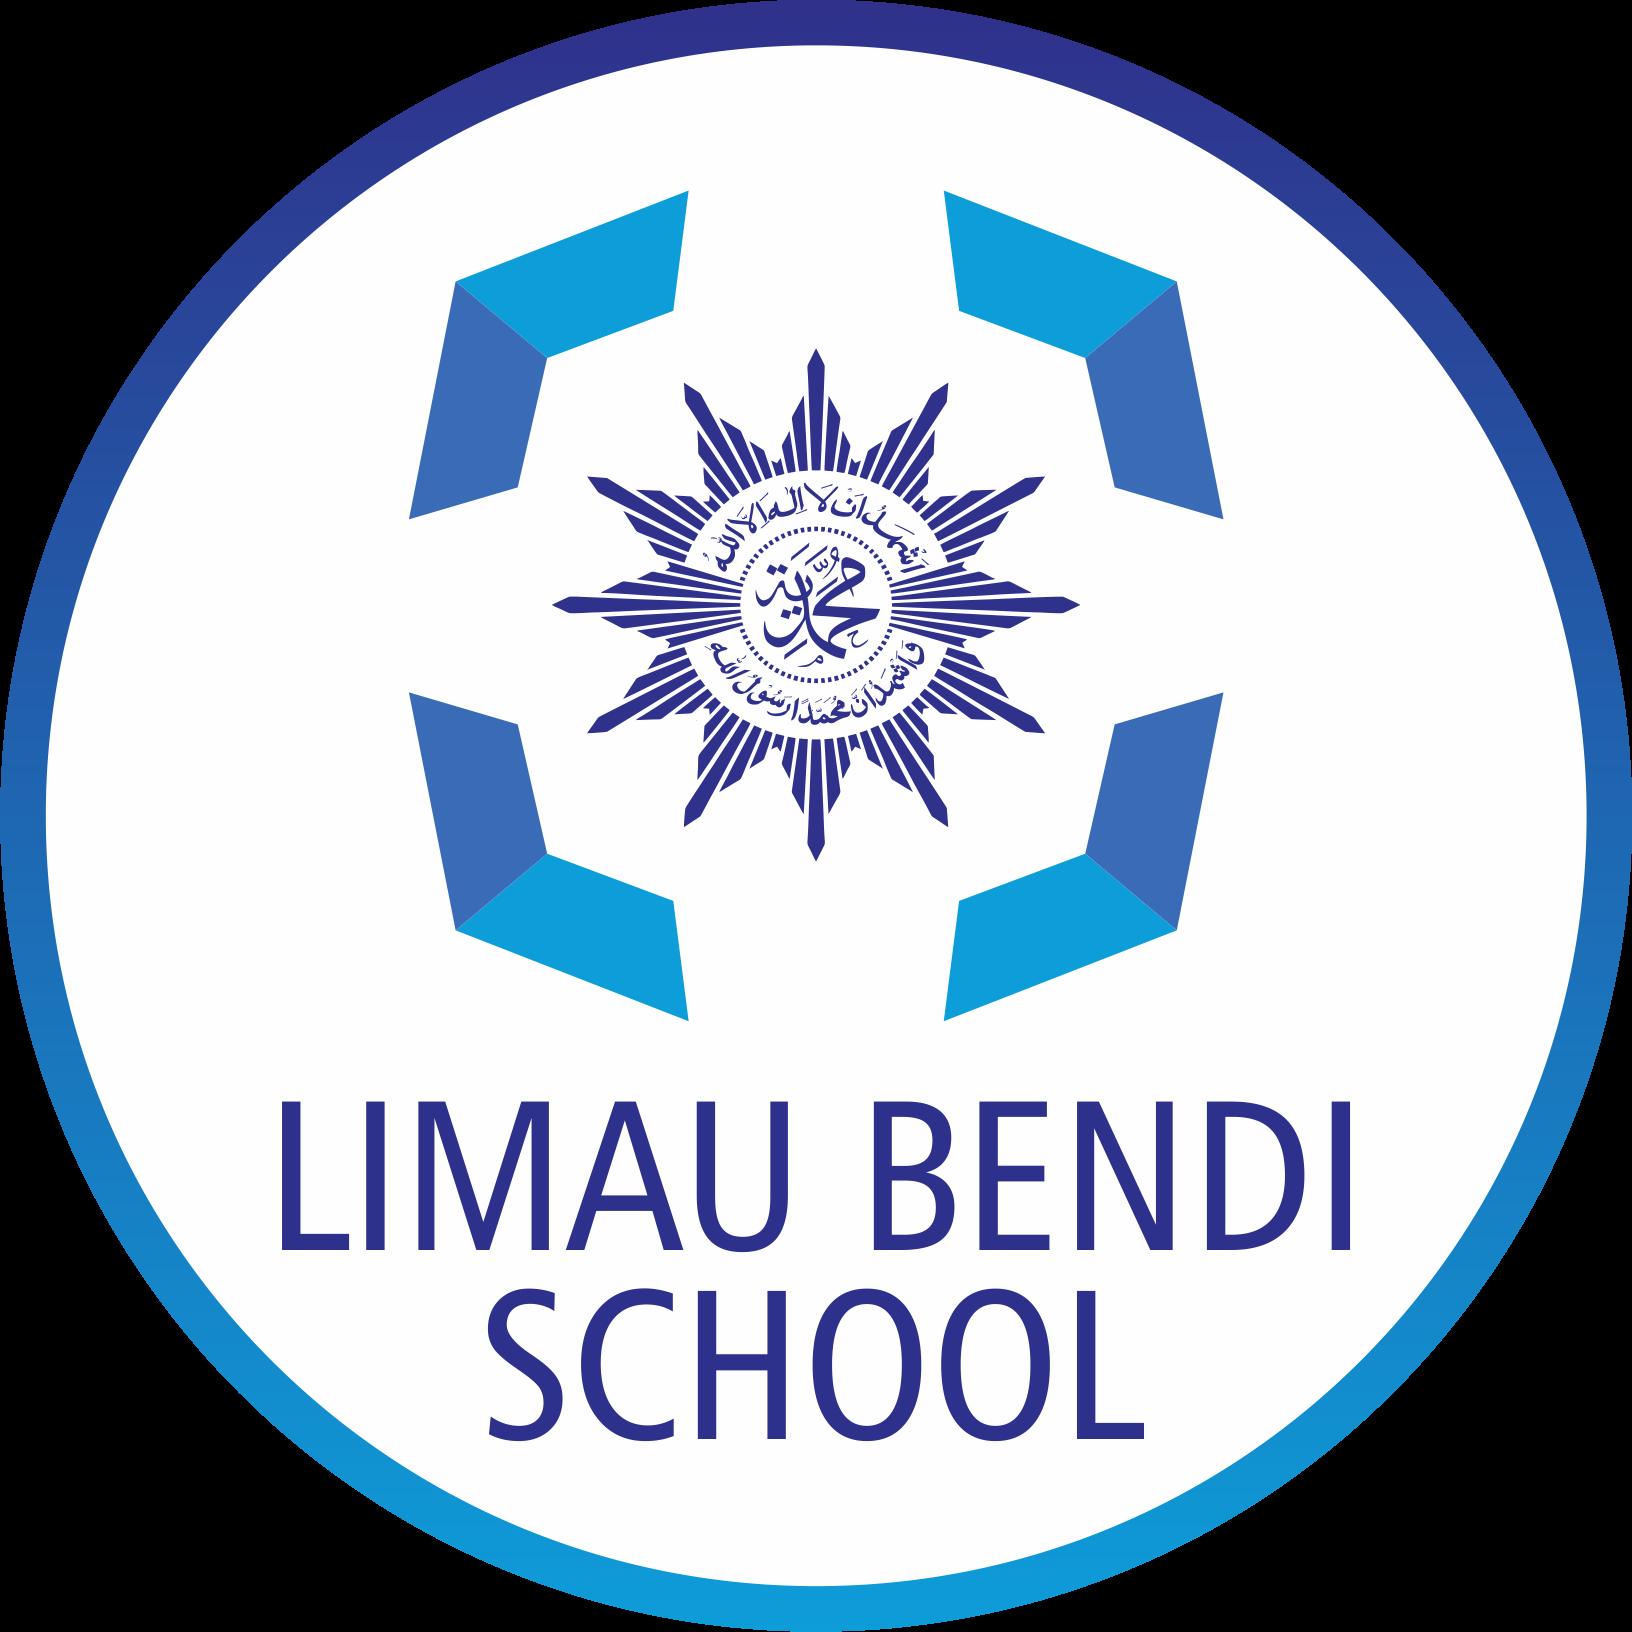 Limau Bendi School